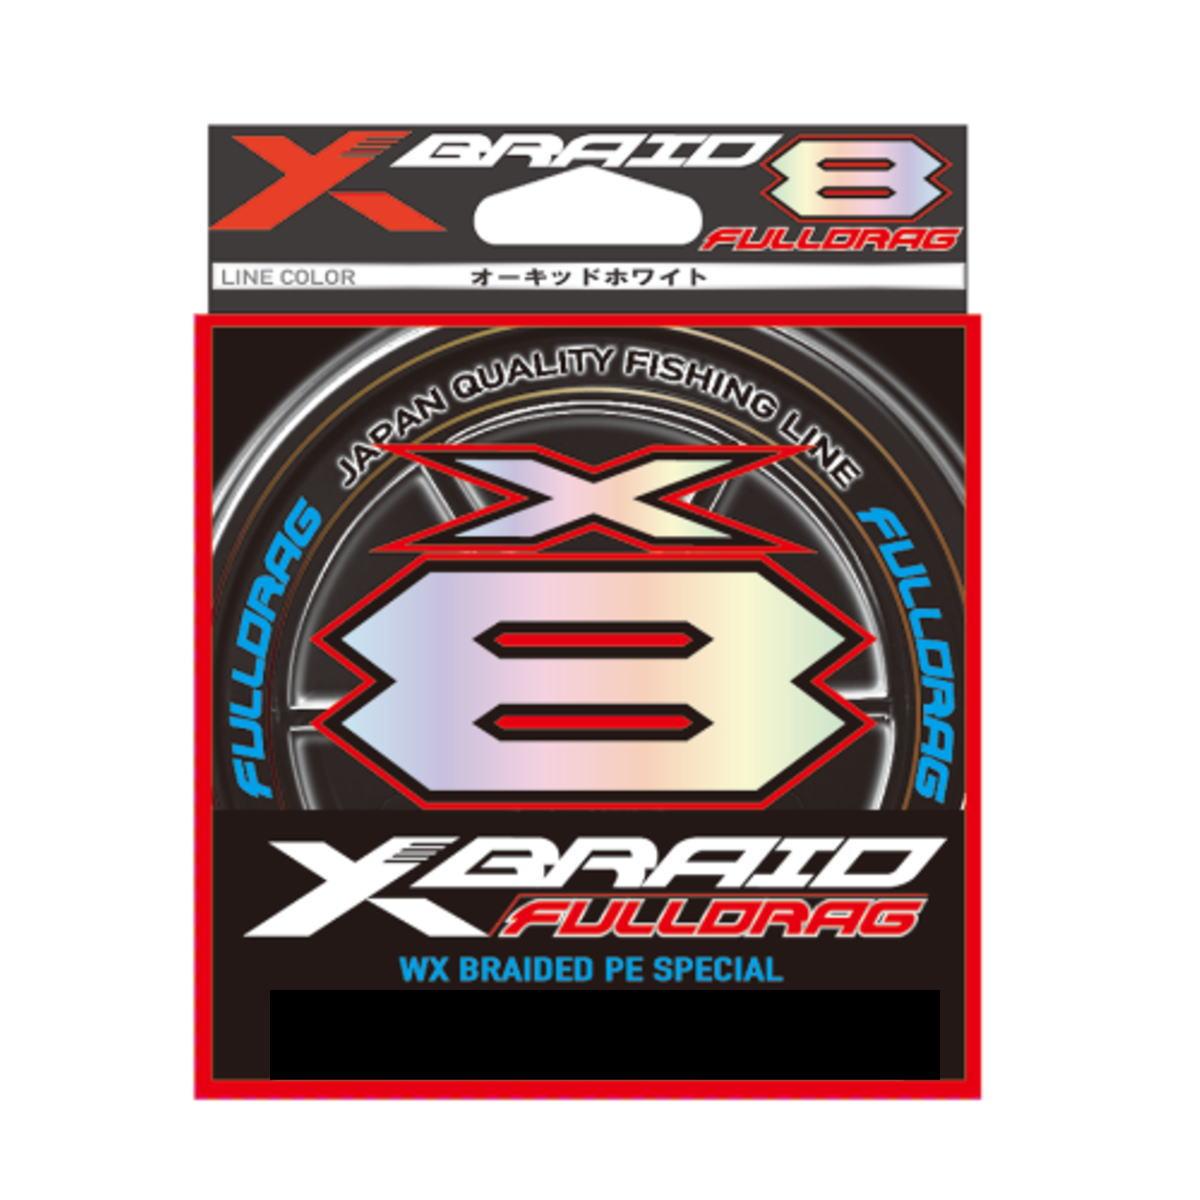 YGK Xブレイド フルドラグ X8 300m 2号 (45lb) 【メール便 / 代引不可】